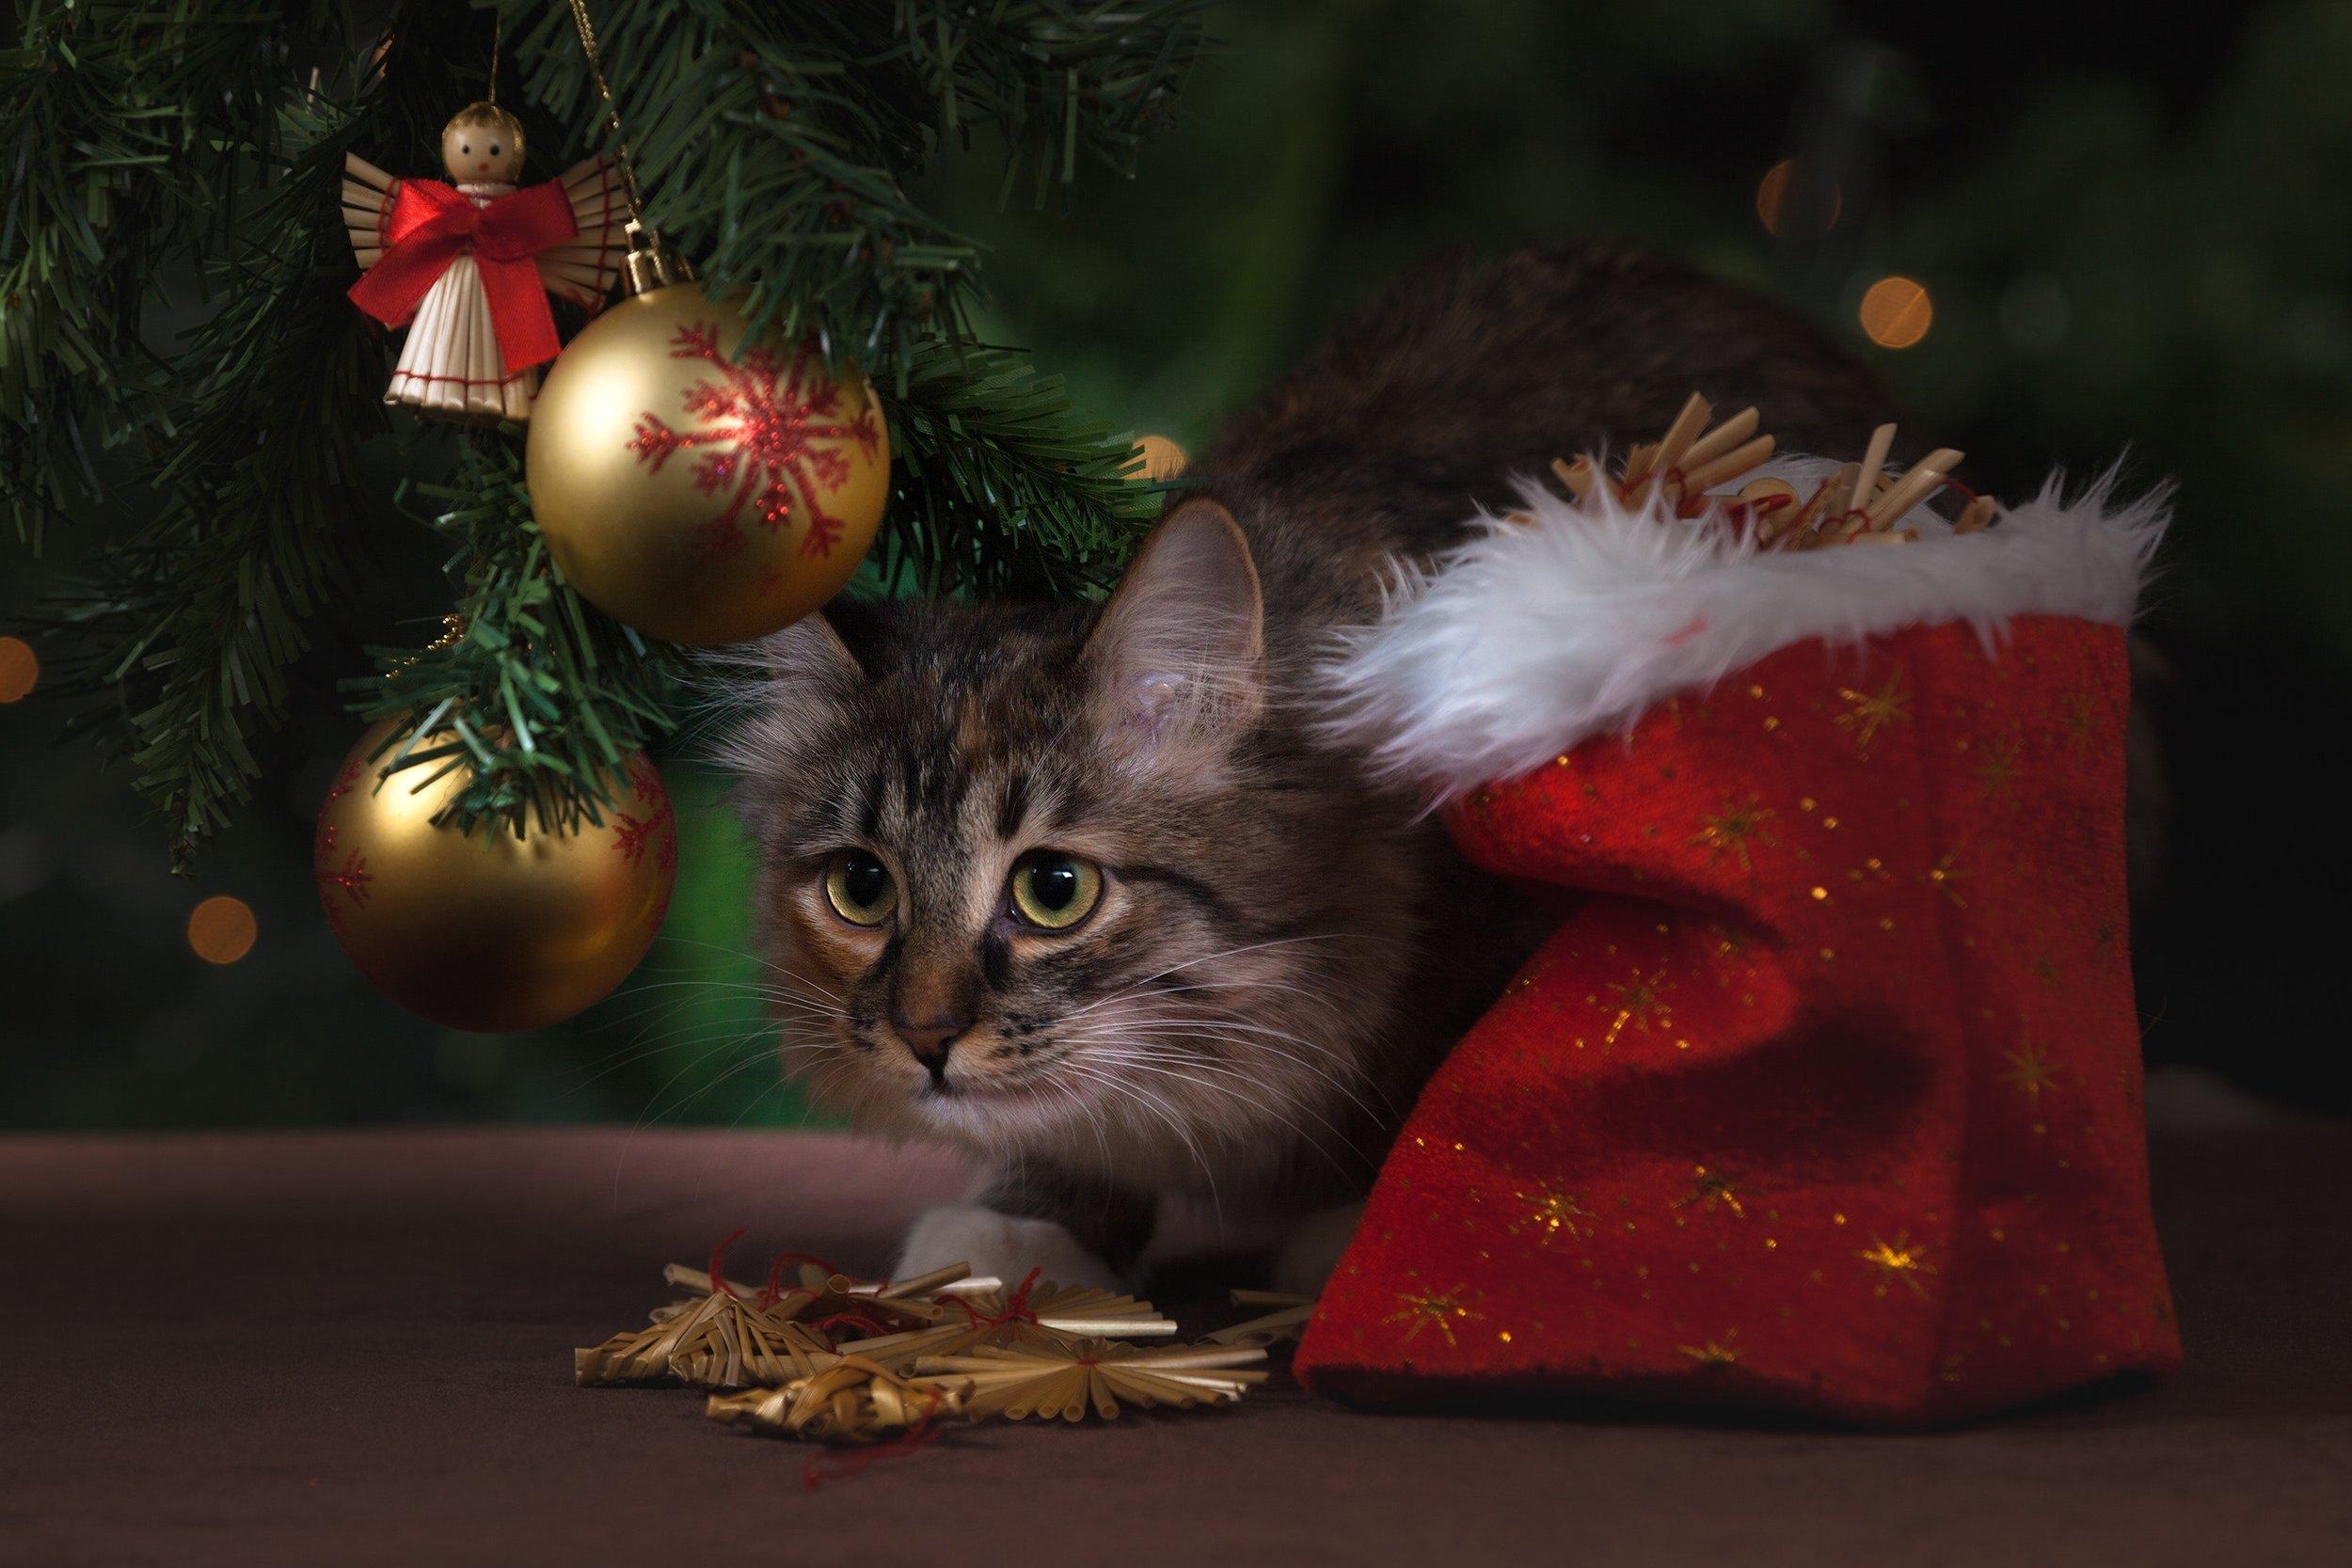 adorable-animal-cat-236587.jpg